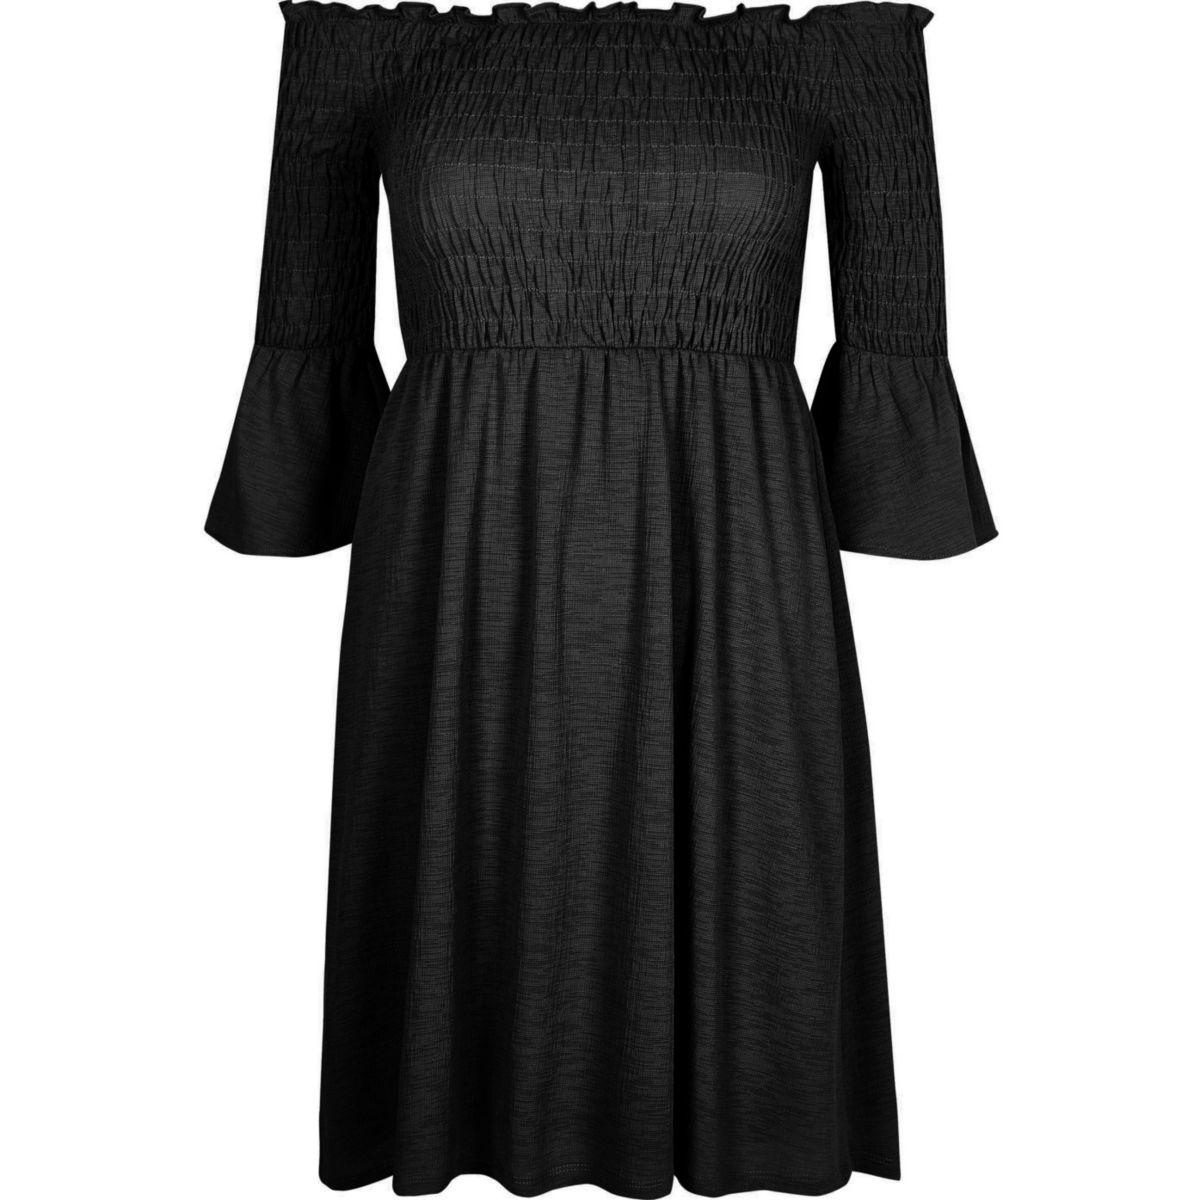 Black shirred bardot dress